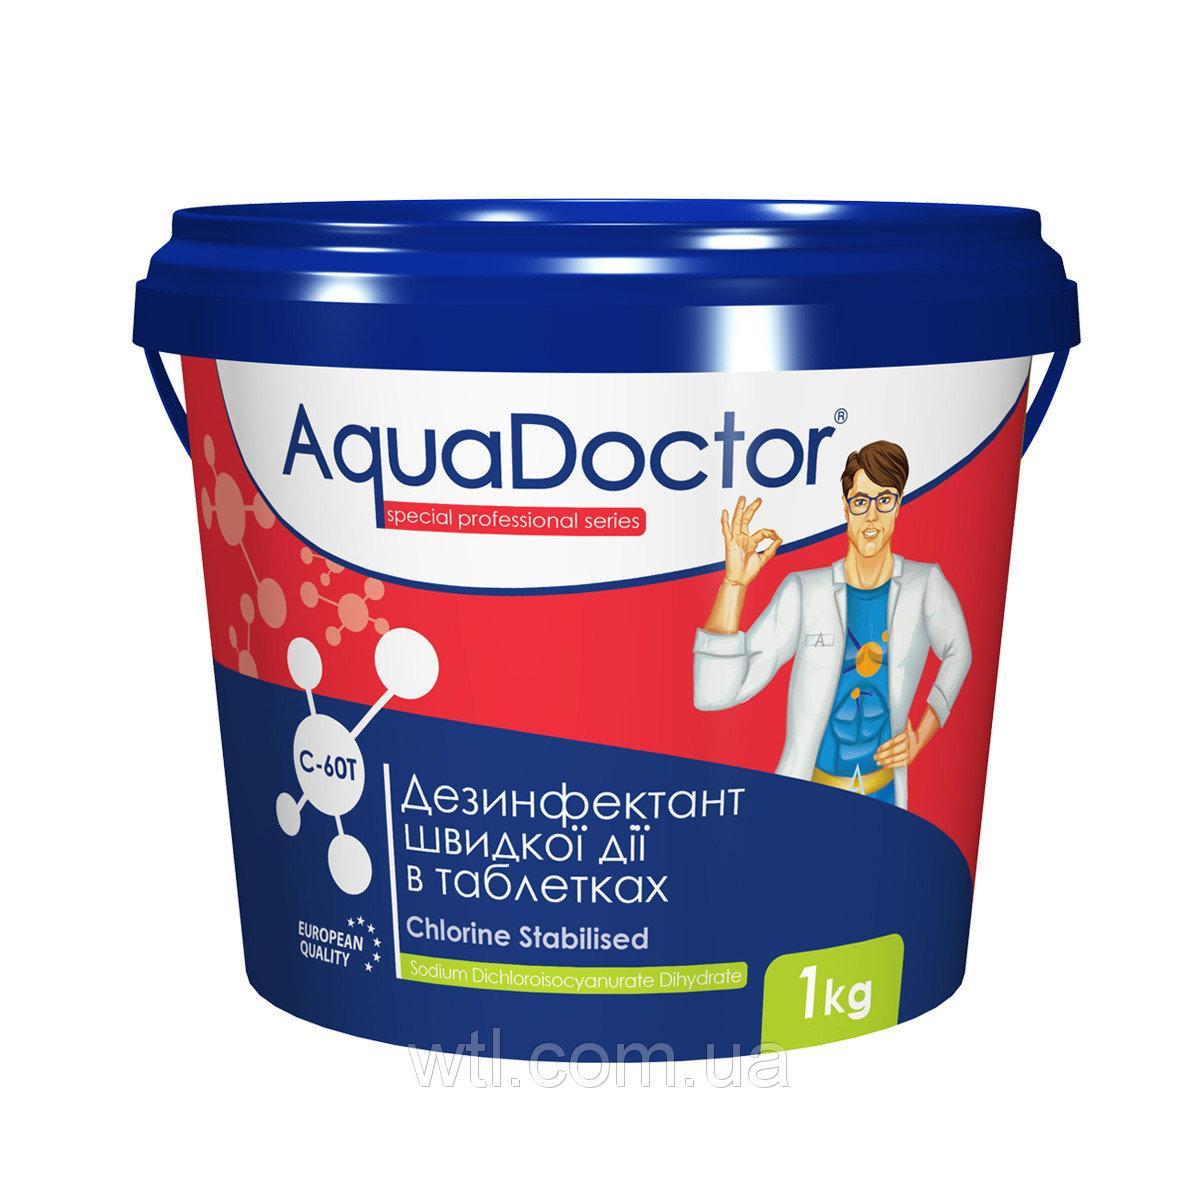 Шок хлор AquaDoctor C-60T (1 кг). Быстрый хлор. Химия для бассейна